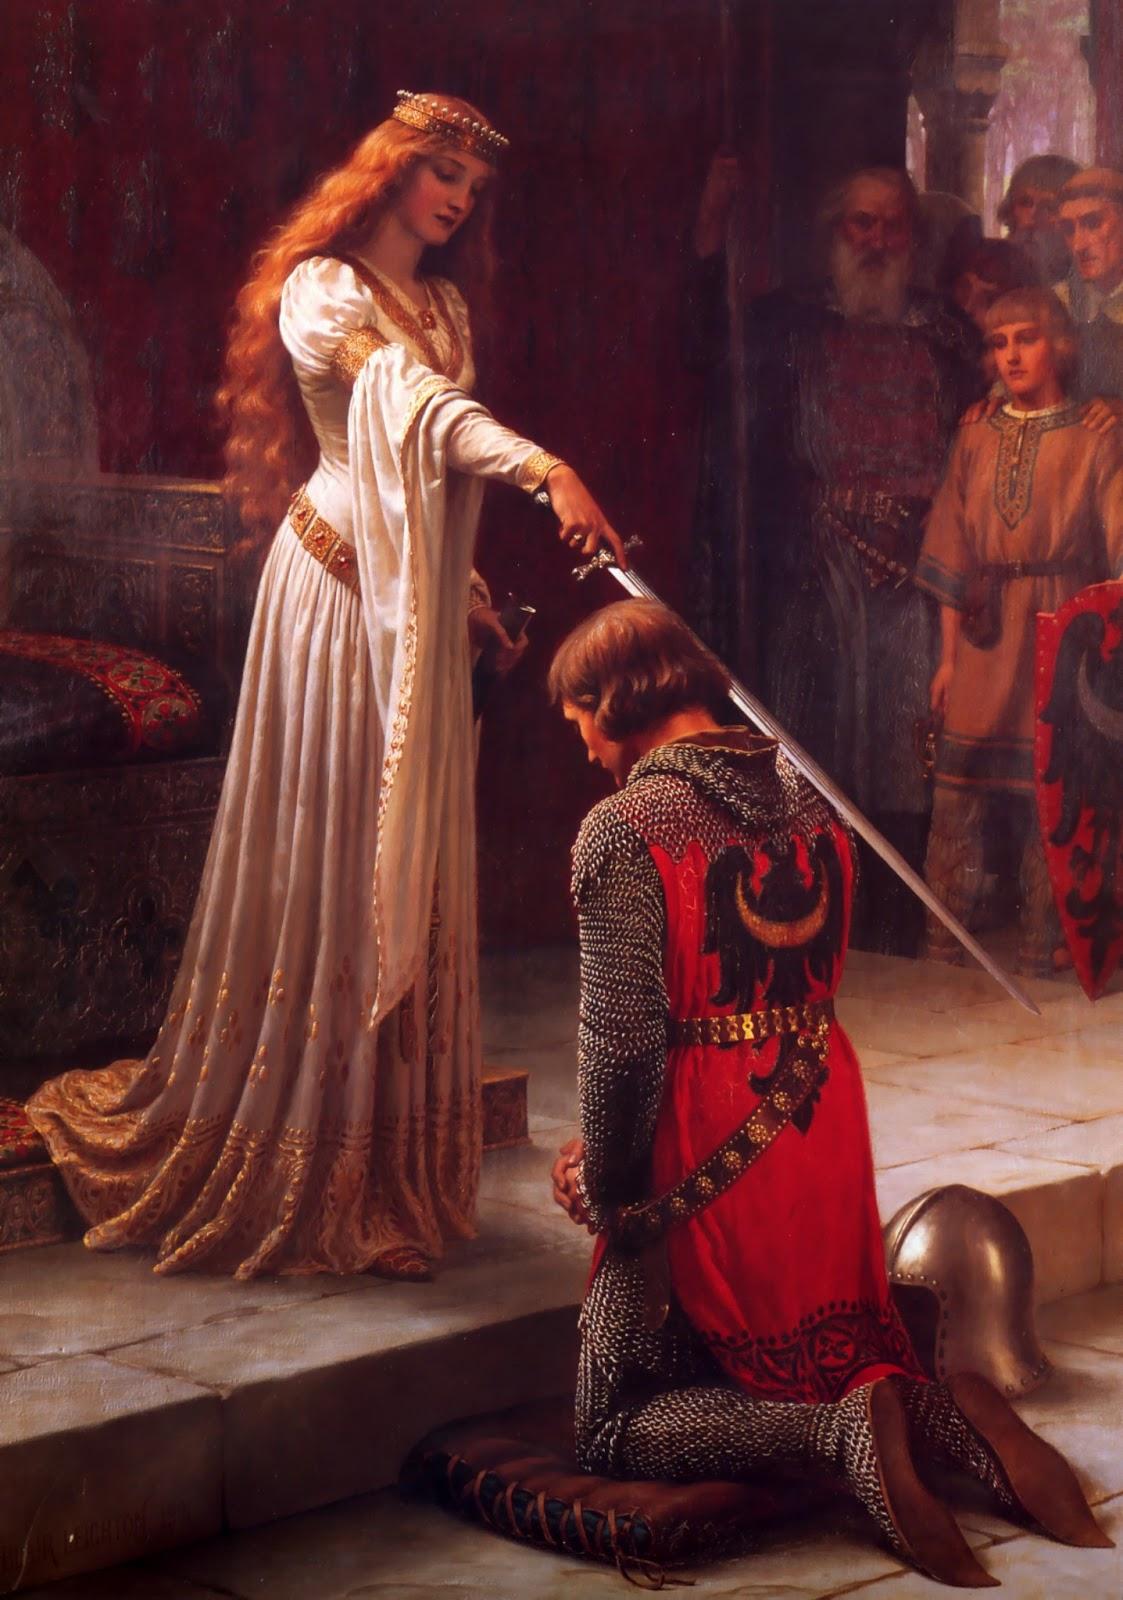 Le Chevalier Courtois Mythe Ou Realite L Ideal Chevaleresque